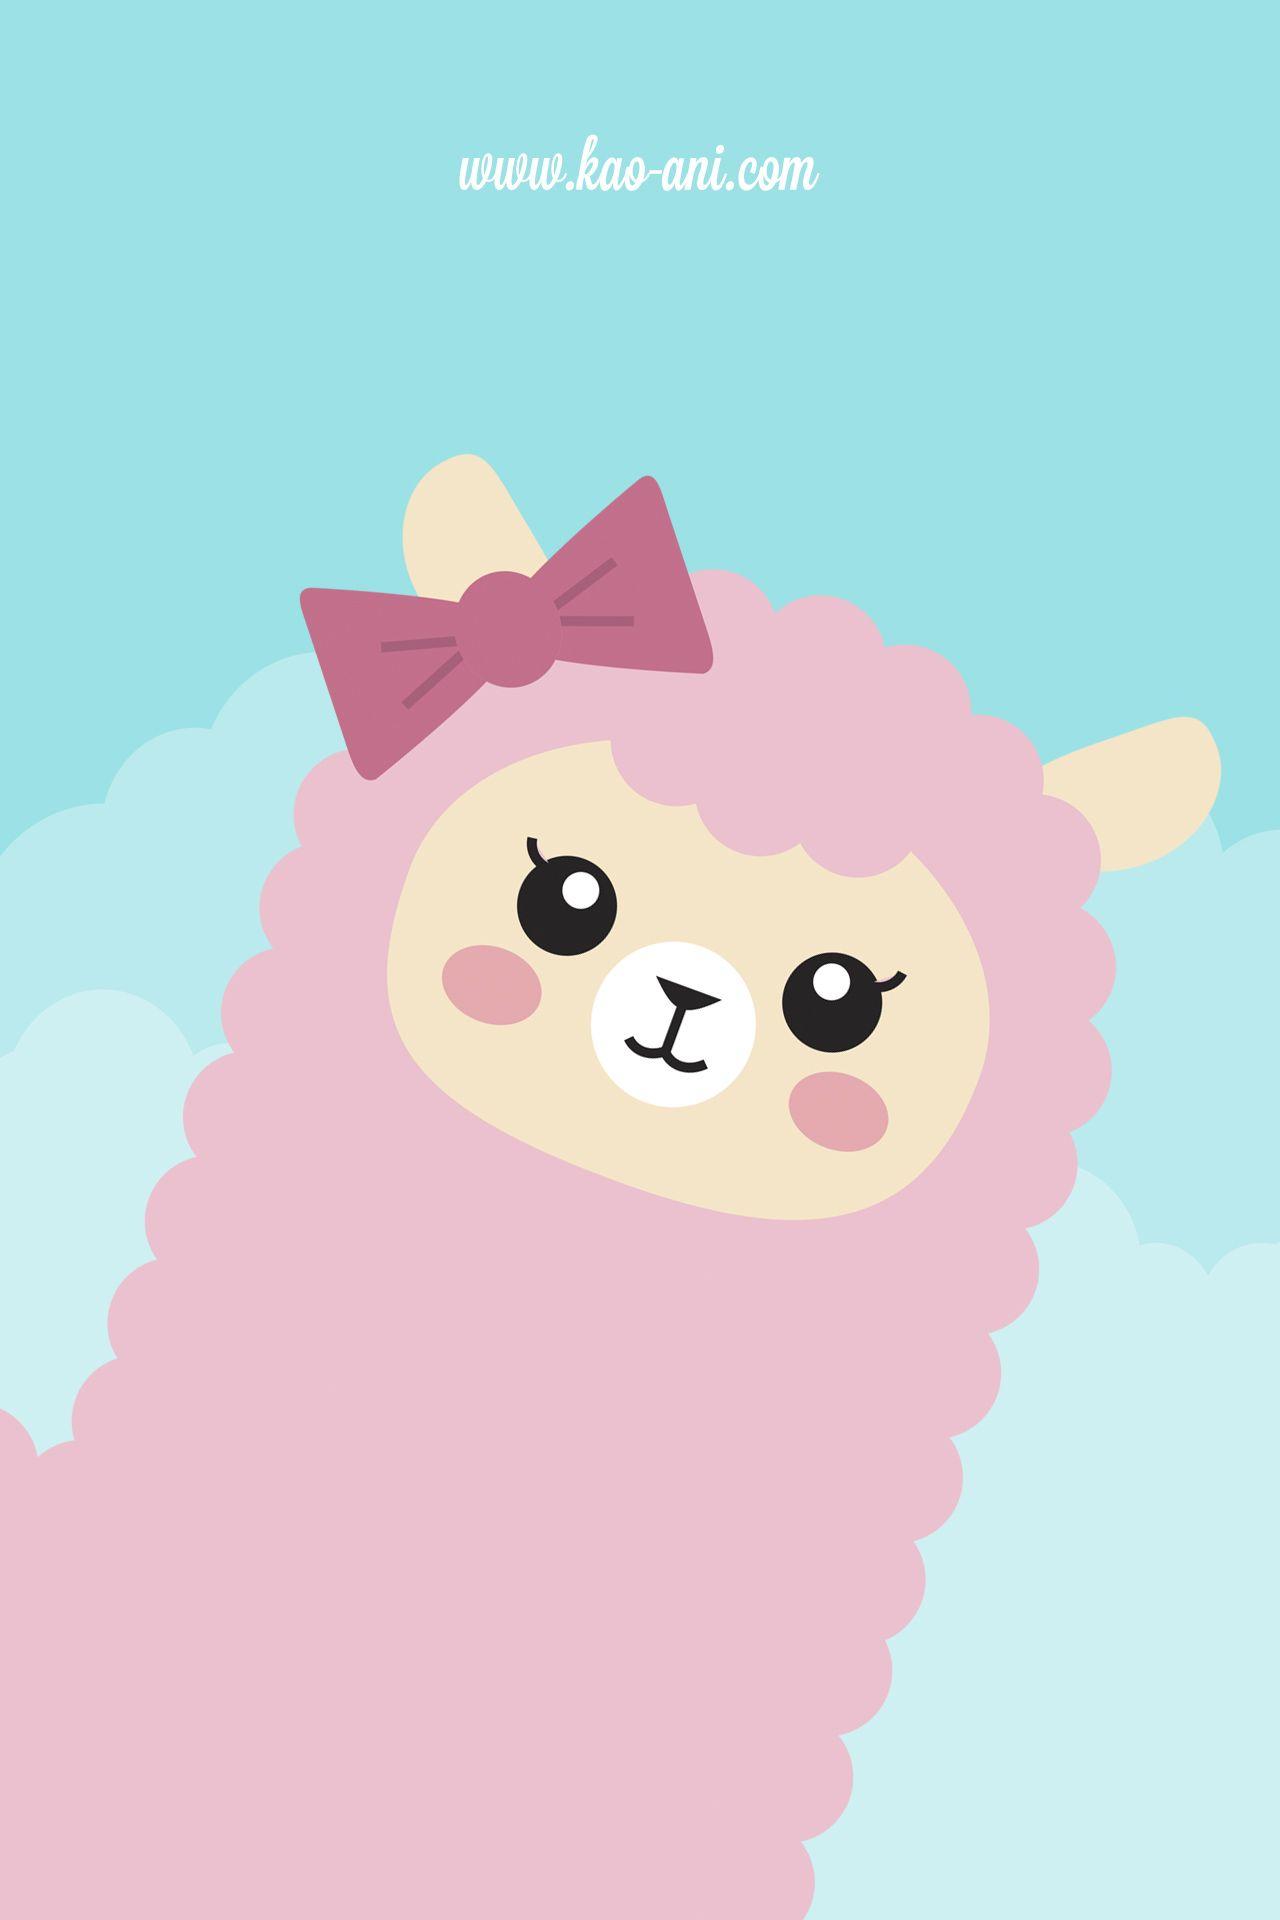 Kawaii iphone wallpaper tumblr - Alpaca Kawaii Buscar Con Google Wallpaper Iphone Cutetumblr